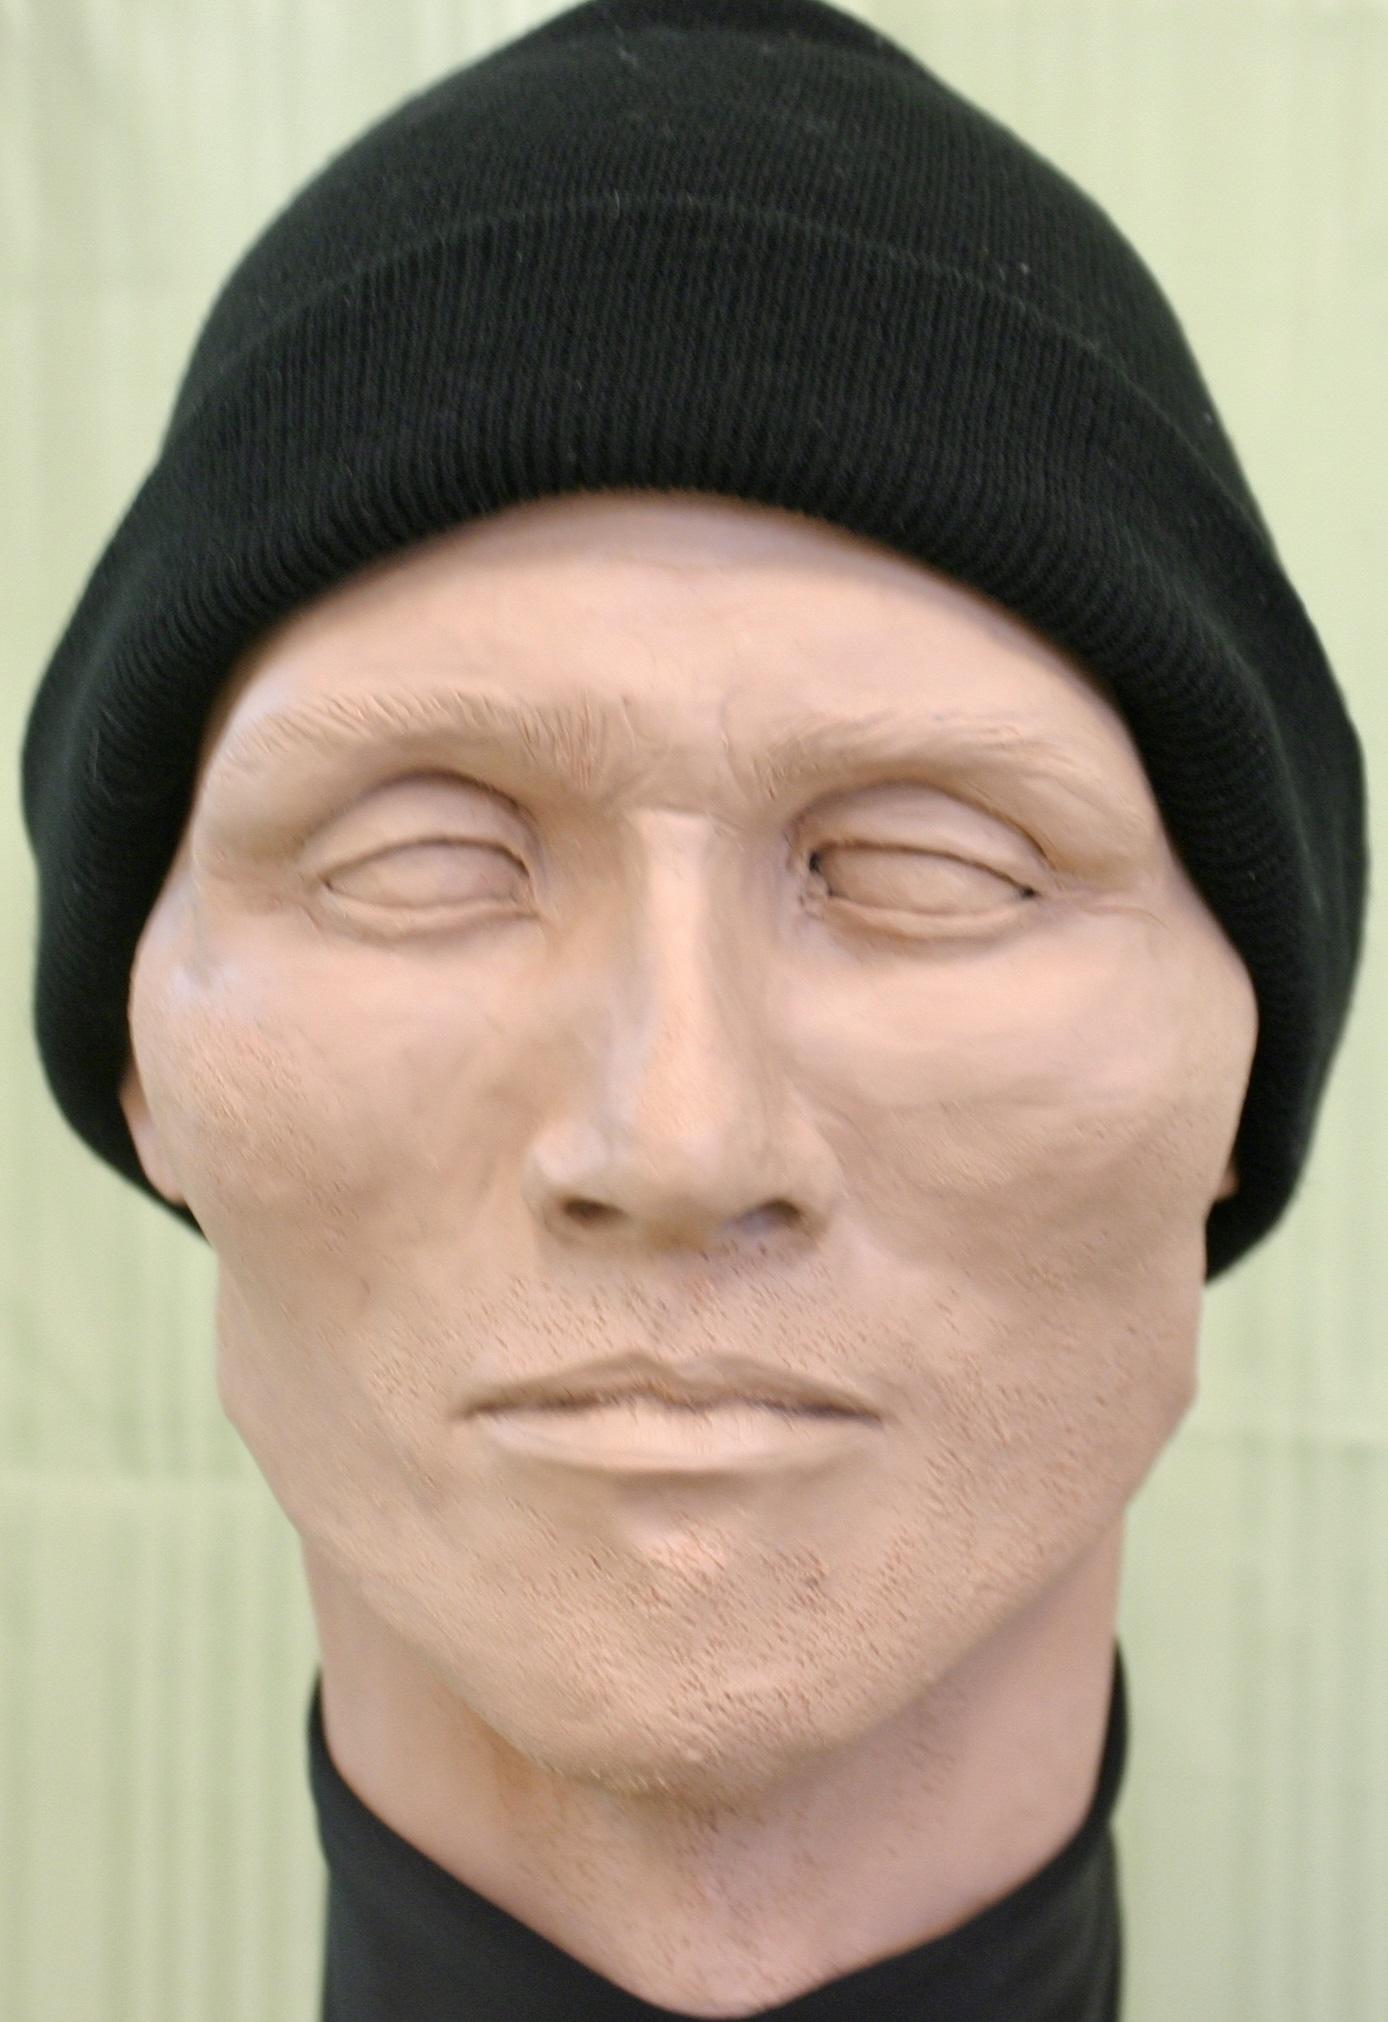 Cape Constantine John Doe